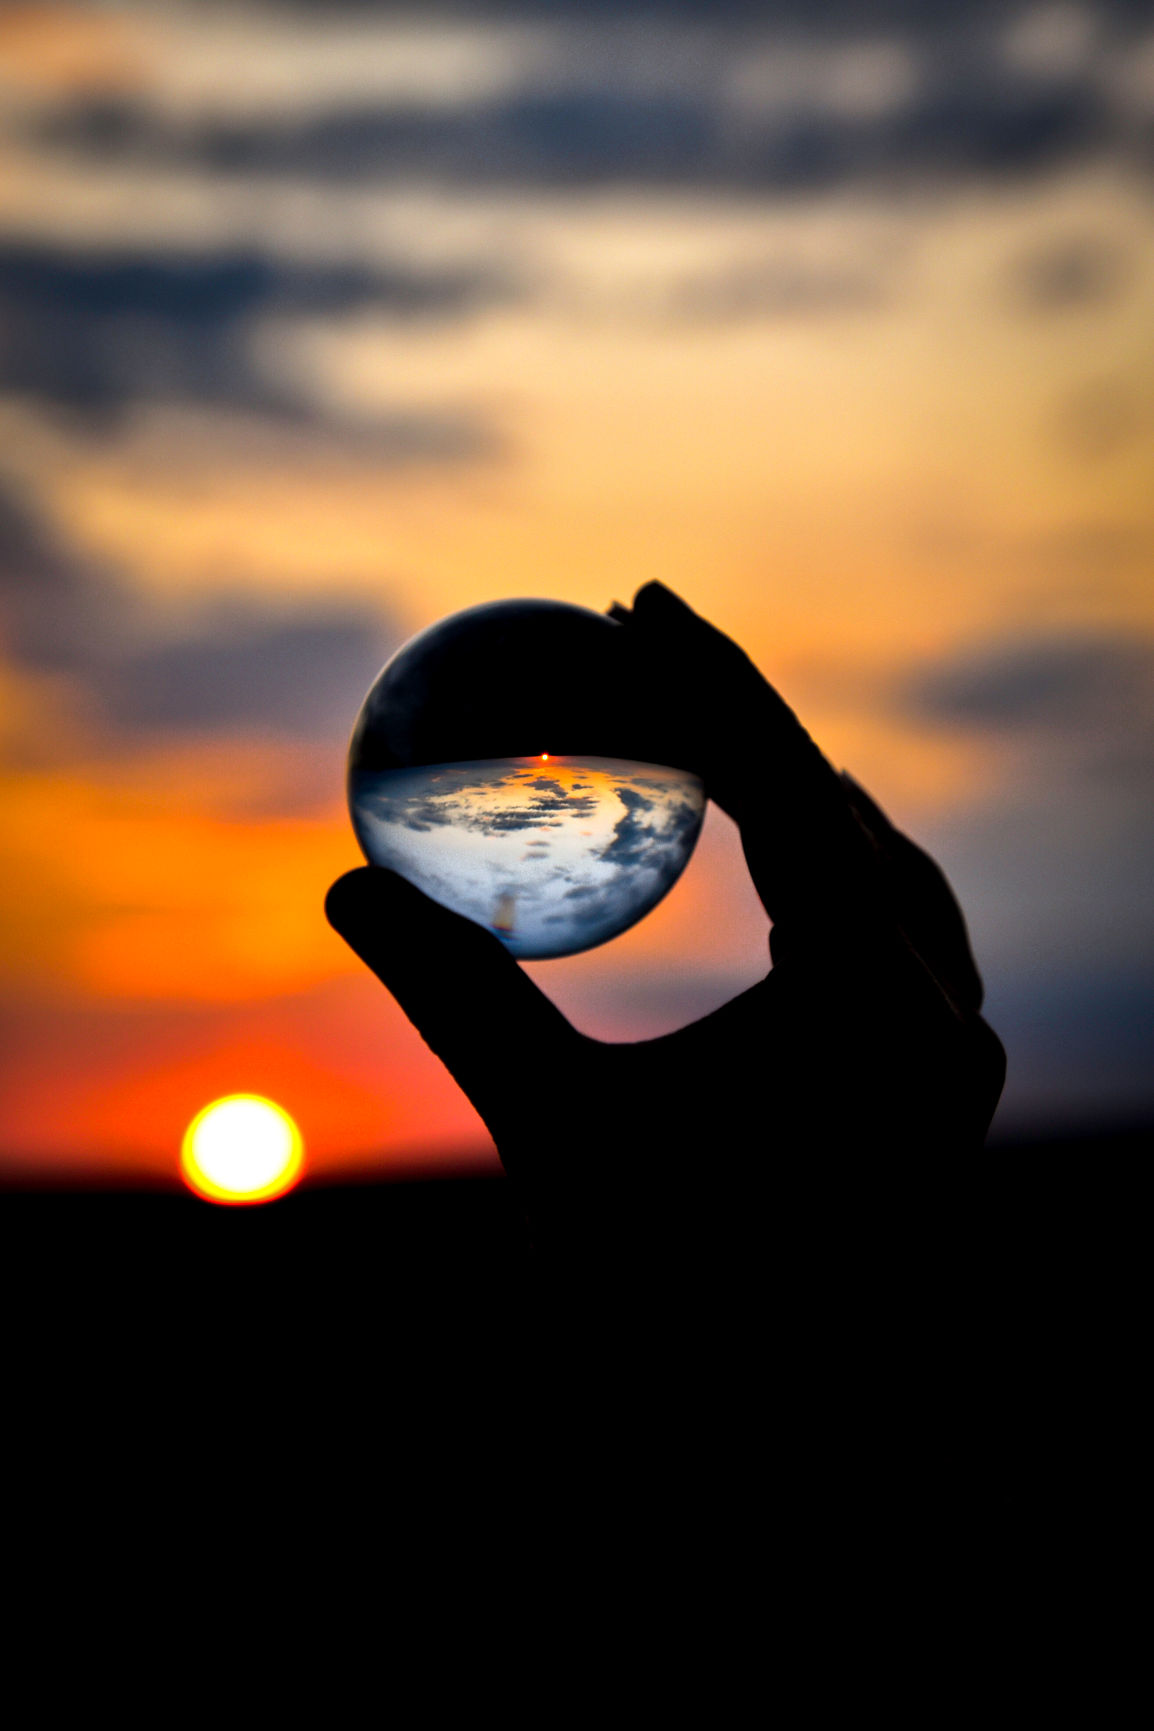 sunset in sphere